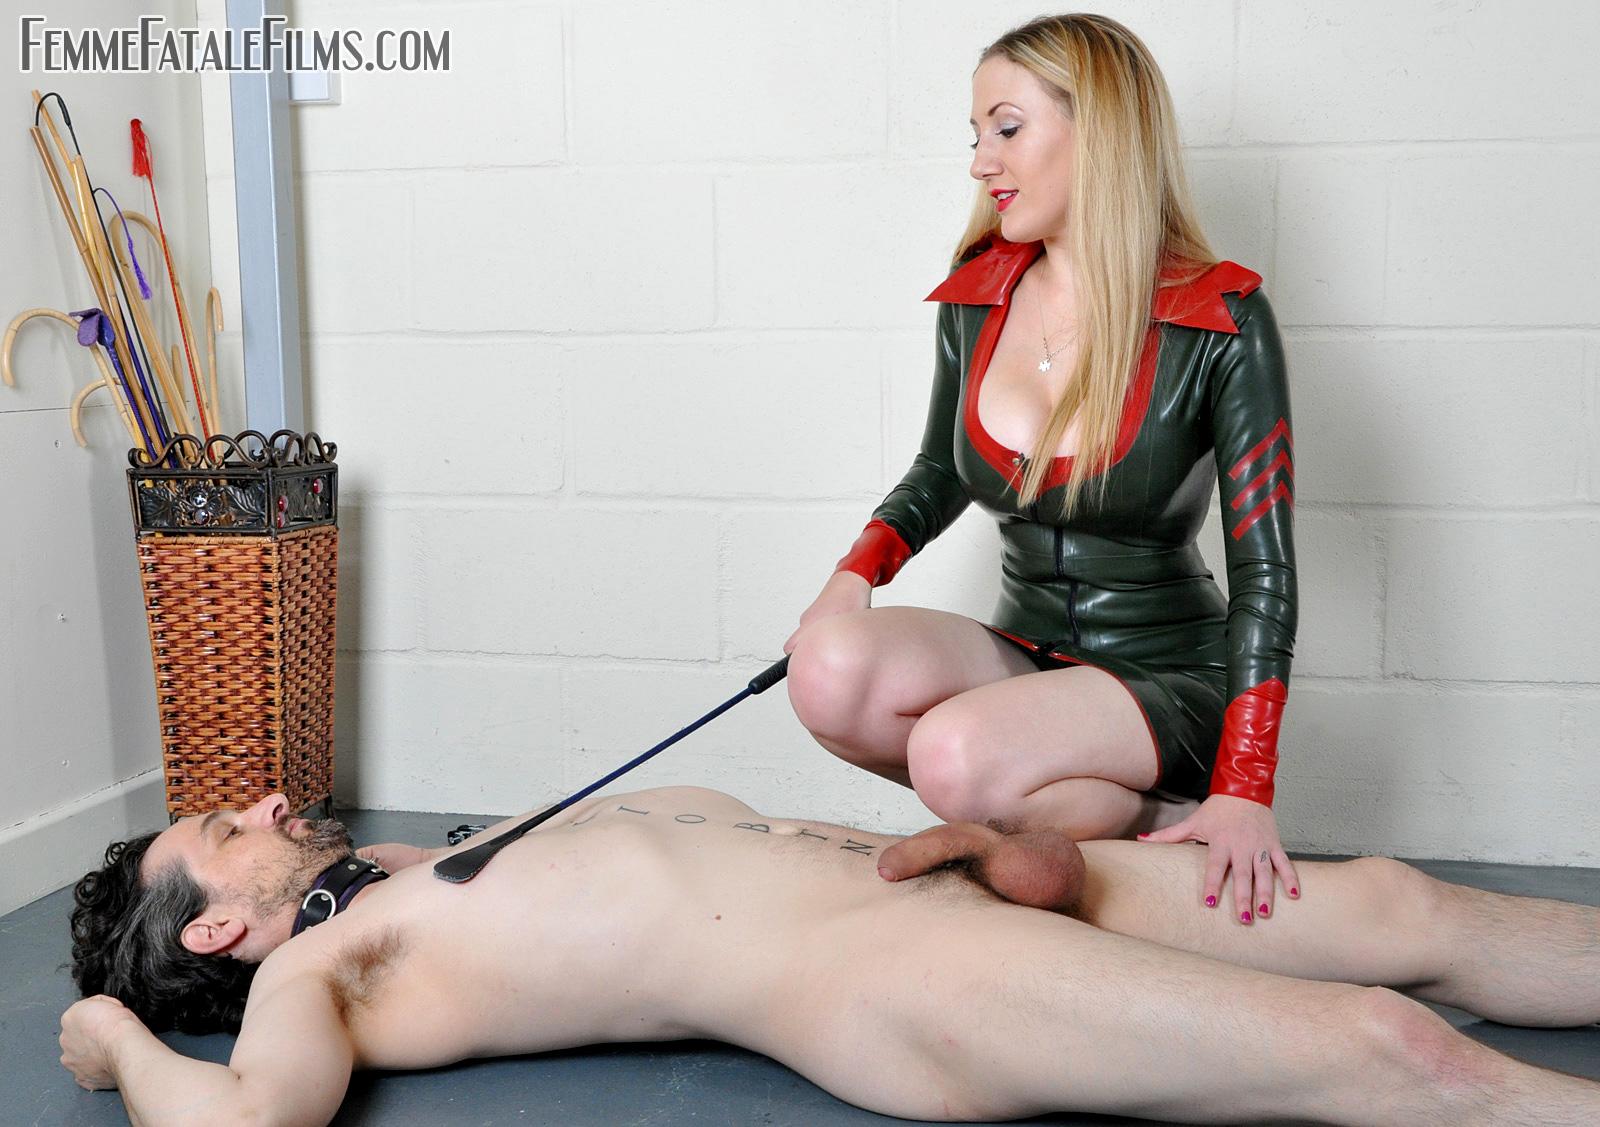 Cbt porn pics, cock ball torture sex images, cock and ball torture porno